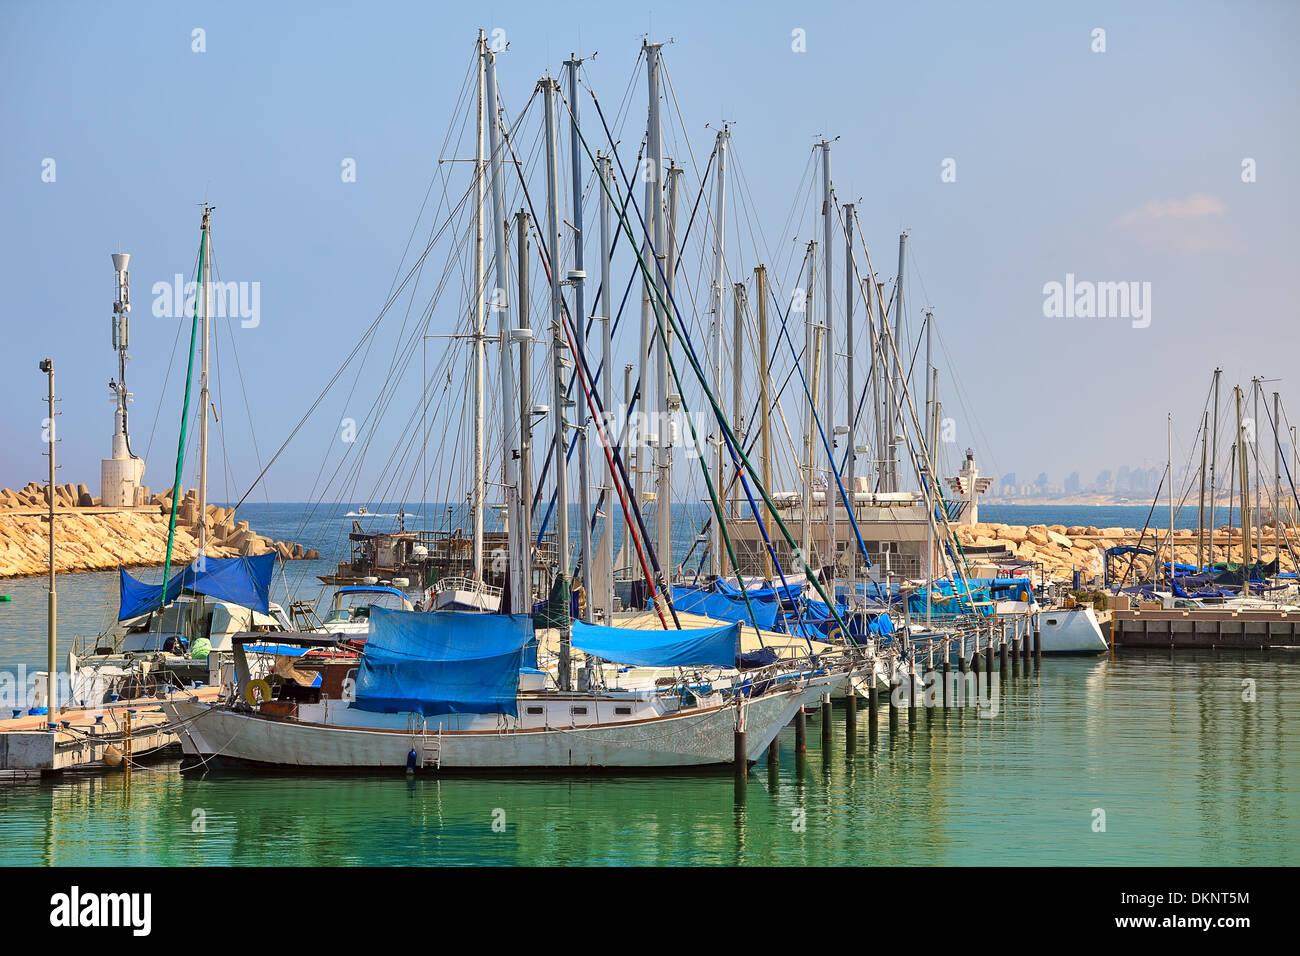 Marina and yachts on Mediterranean sea in city of Ashqelon, Israel. - Stock Image